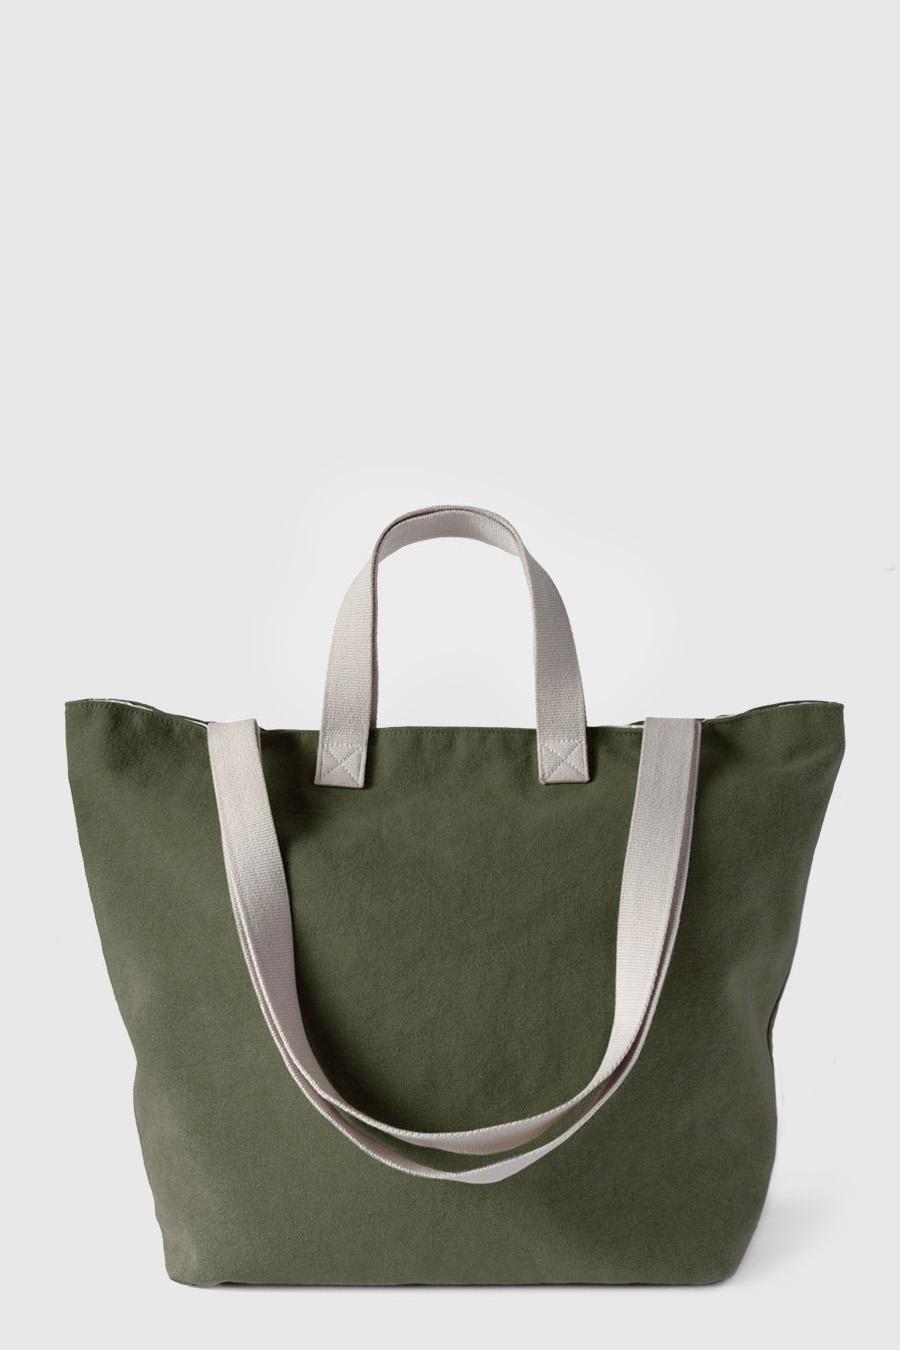 Bolsa grande para la playa impermeable color verde made in Spain